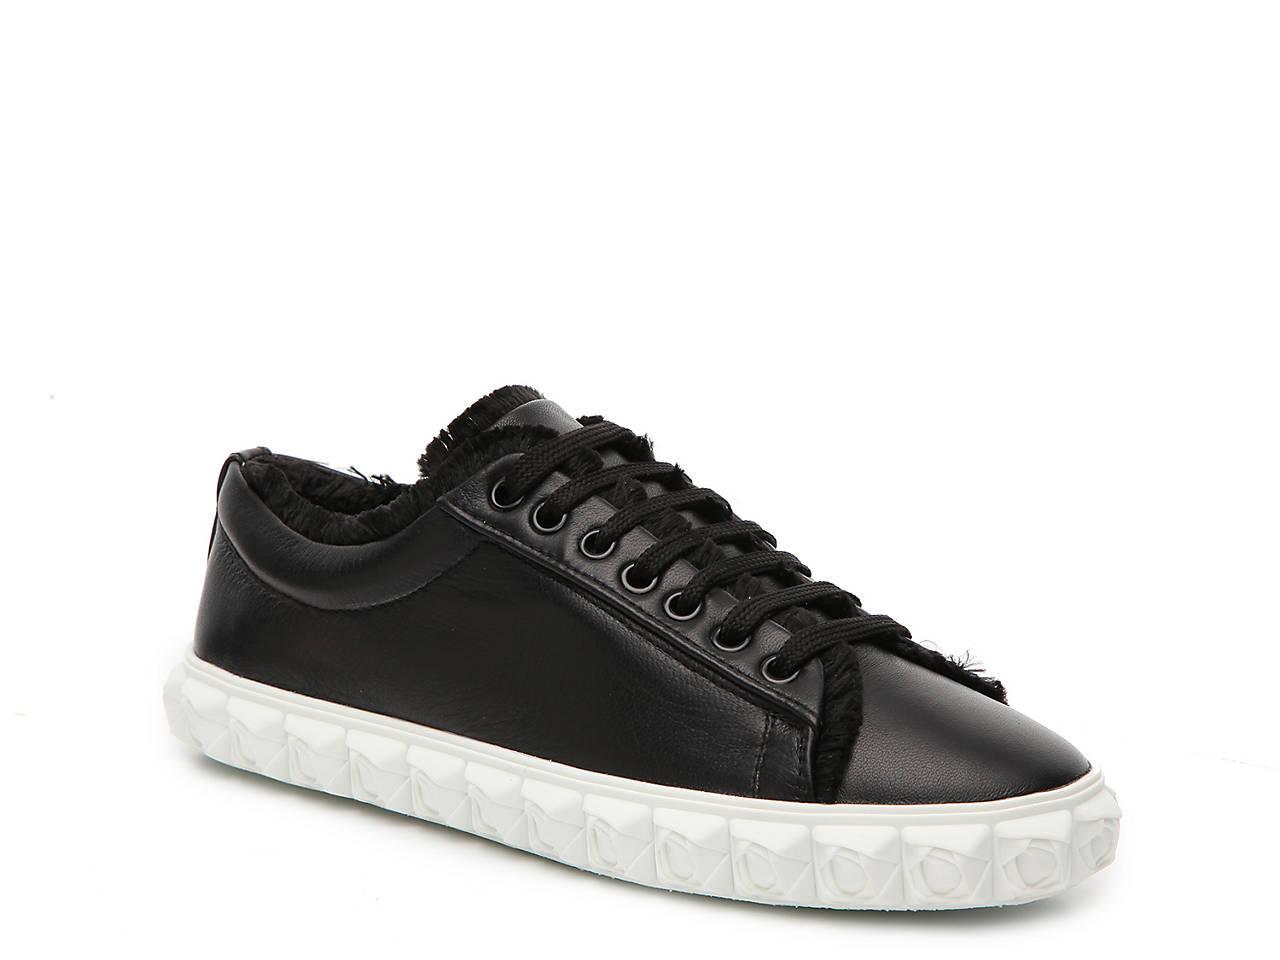 a0461efeb5dc Stuart Weitzman Fringiec Sneaker Women s Shoes